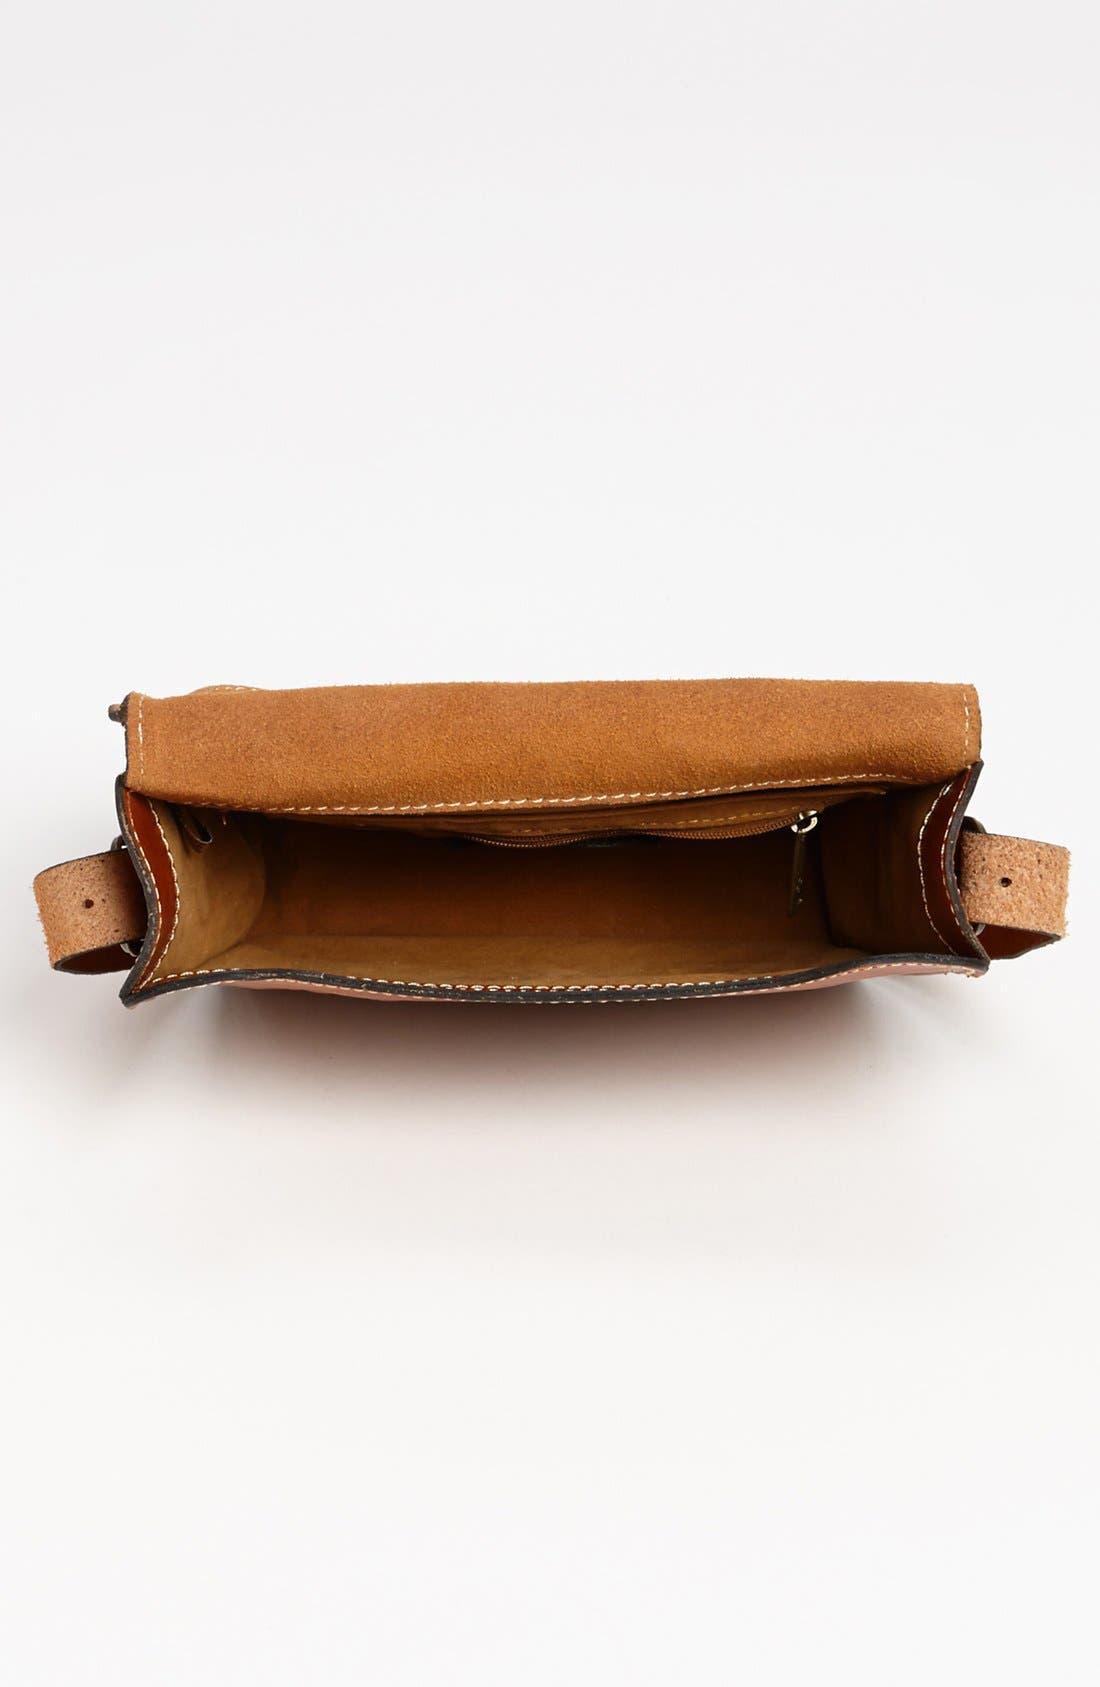 Alternate Image 3  - Patricia Nash 'Marciano' Leather Crossbody Bag